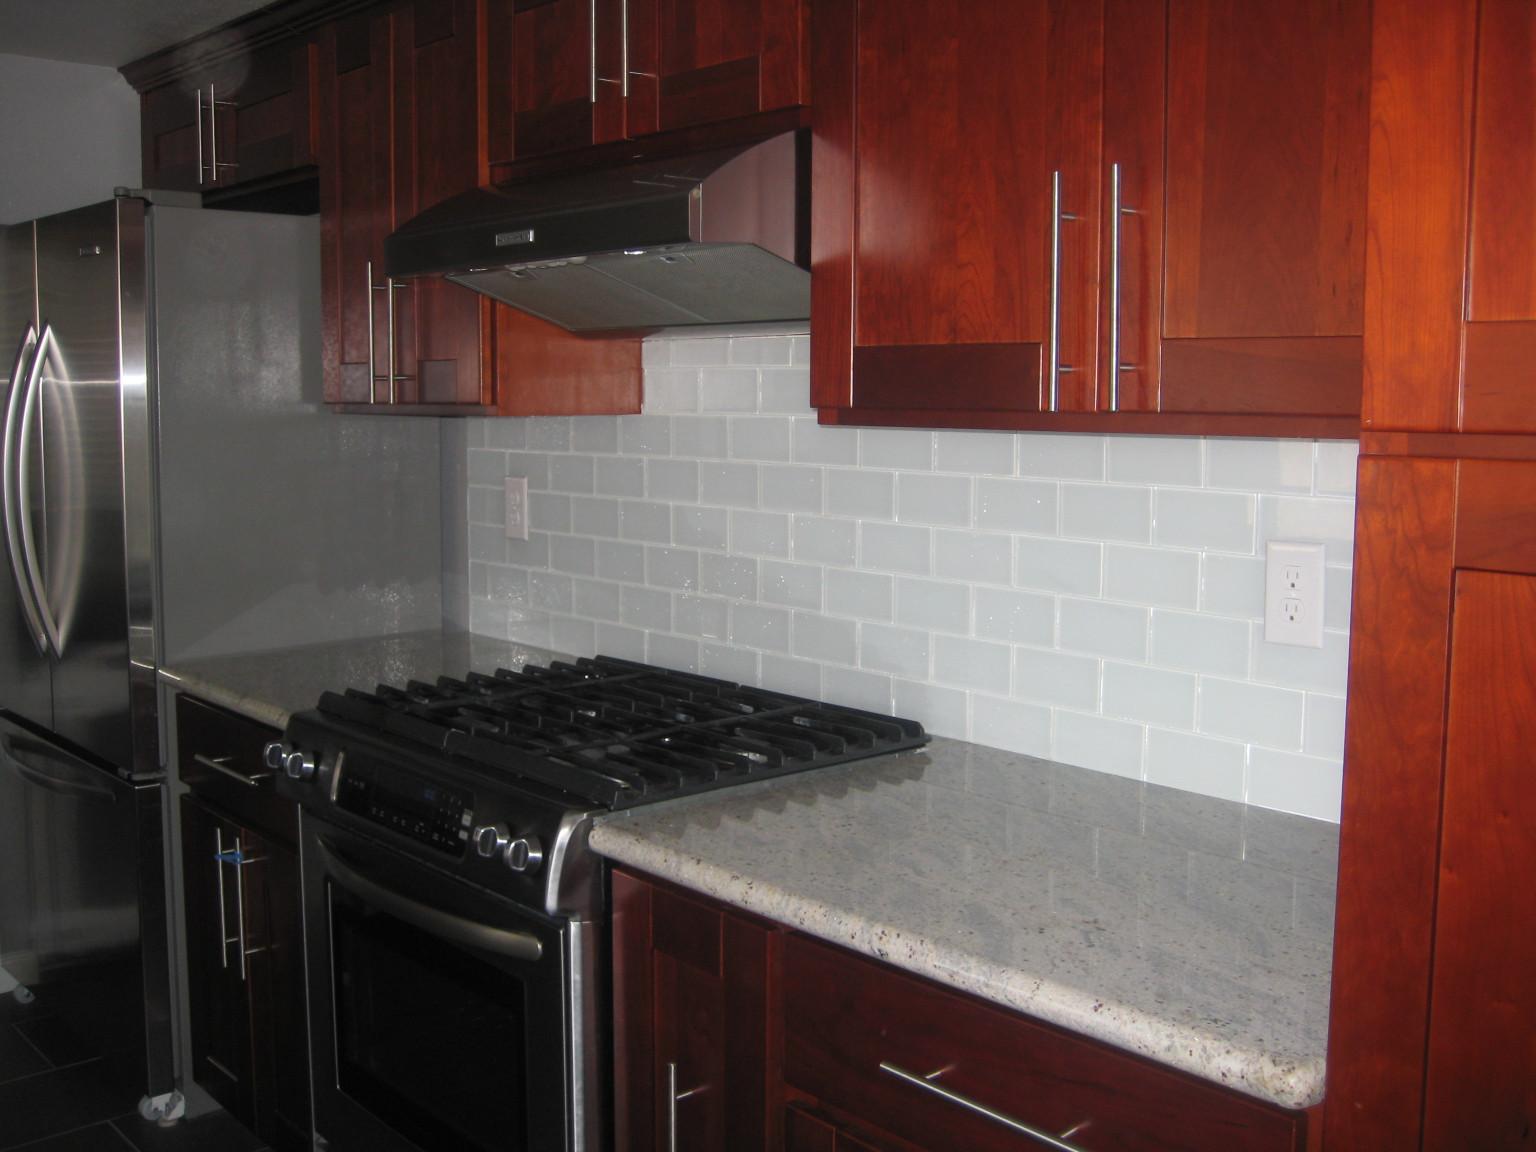 Kitchen Backsplash Subway Tile  White Glass Subway Tile Subway Tile Outlet